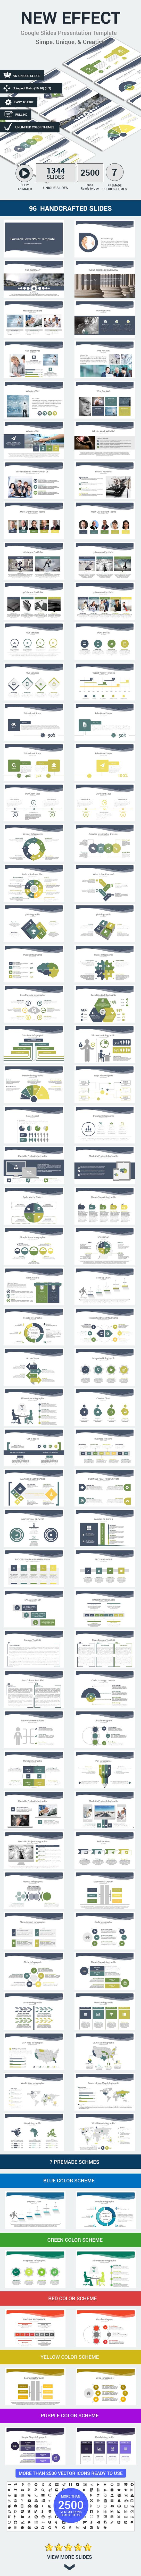 New Effect Google Slides Presentation Template - Google Slides Presentation Templates